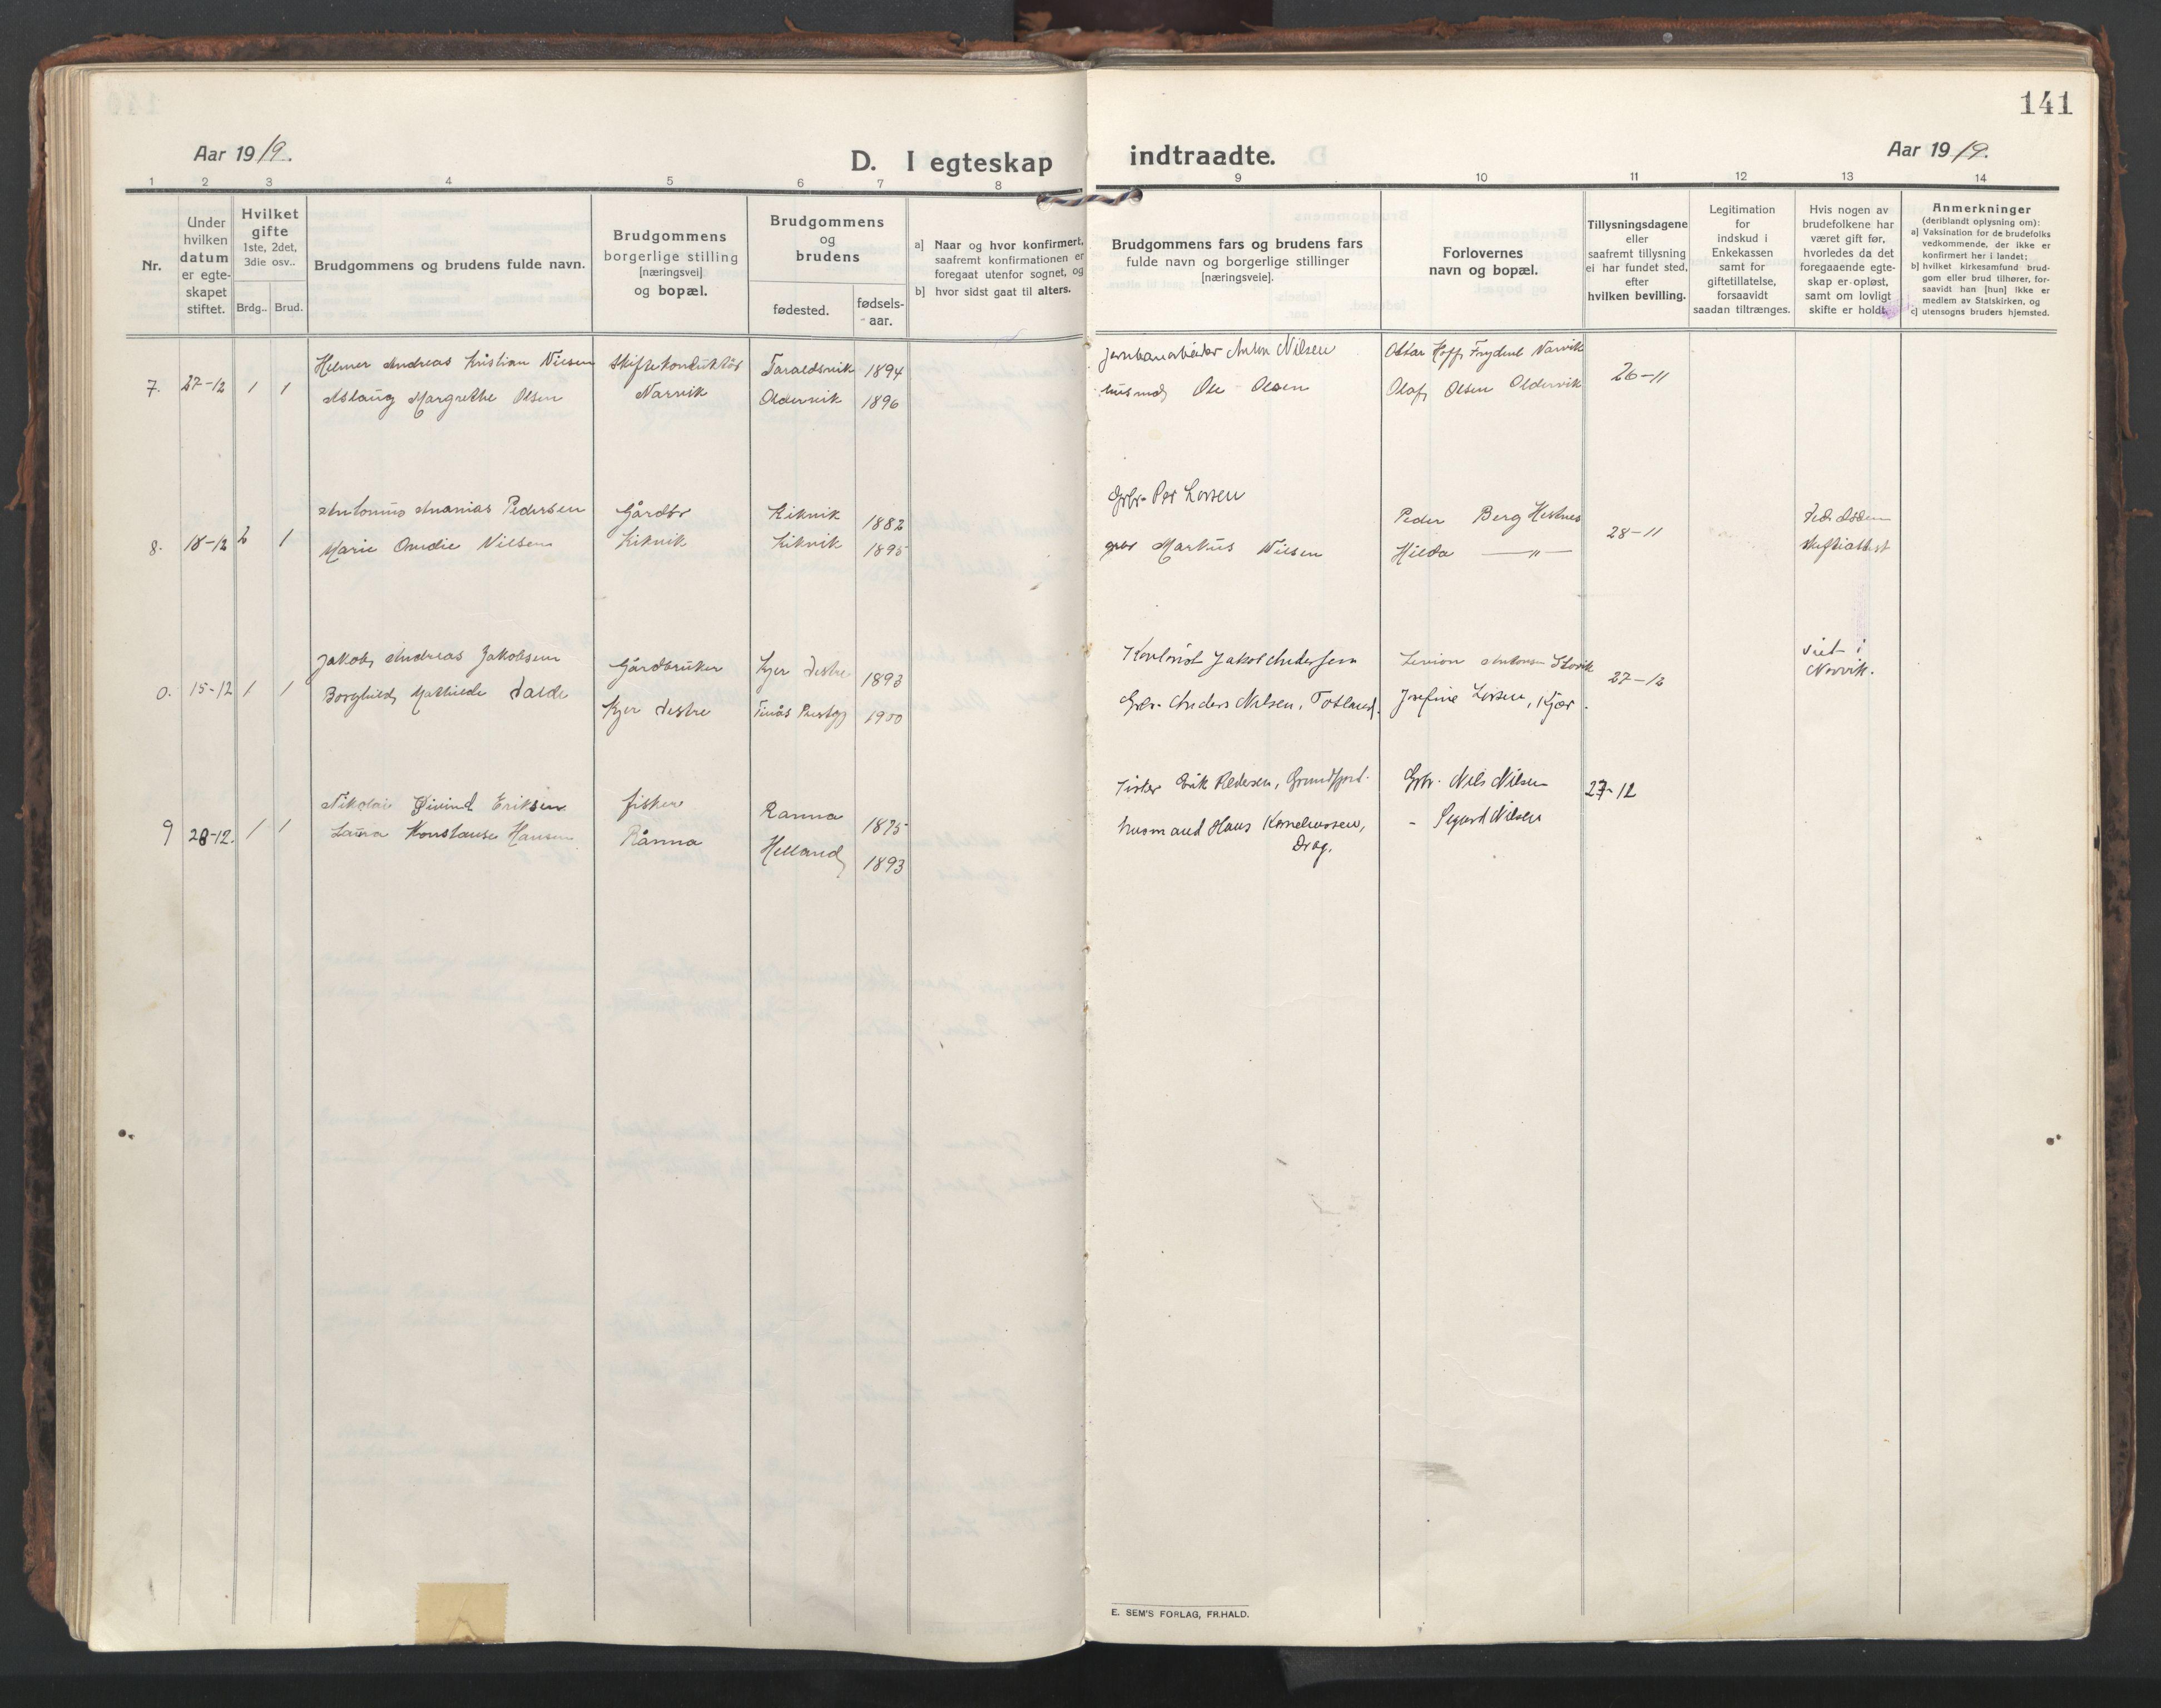 SAT, Ministerialprotokoller, klokkerbøker og fødselsregistre - Nordland, 861/L0872: Ministerialbok nr. 861A07, 1915-1924, s. 141